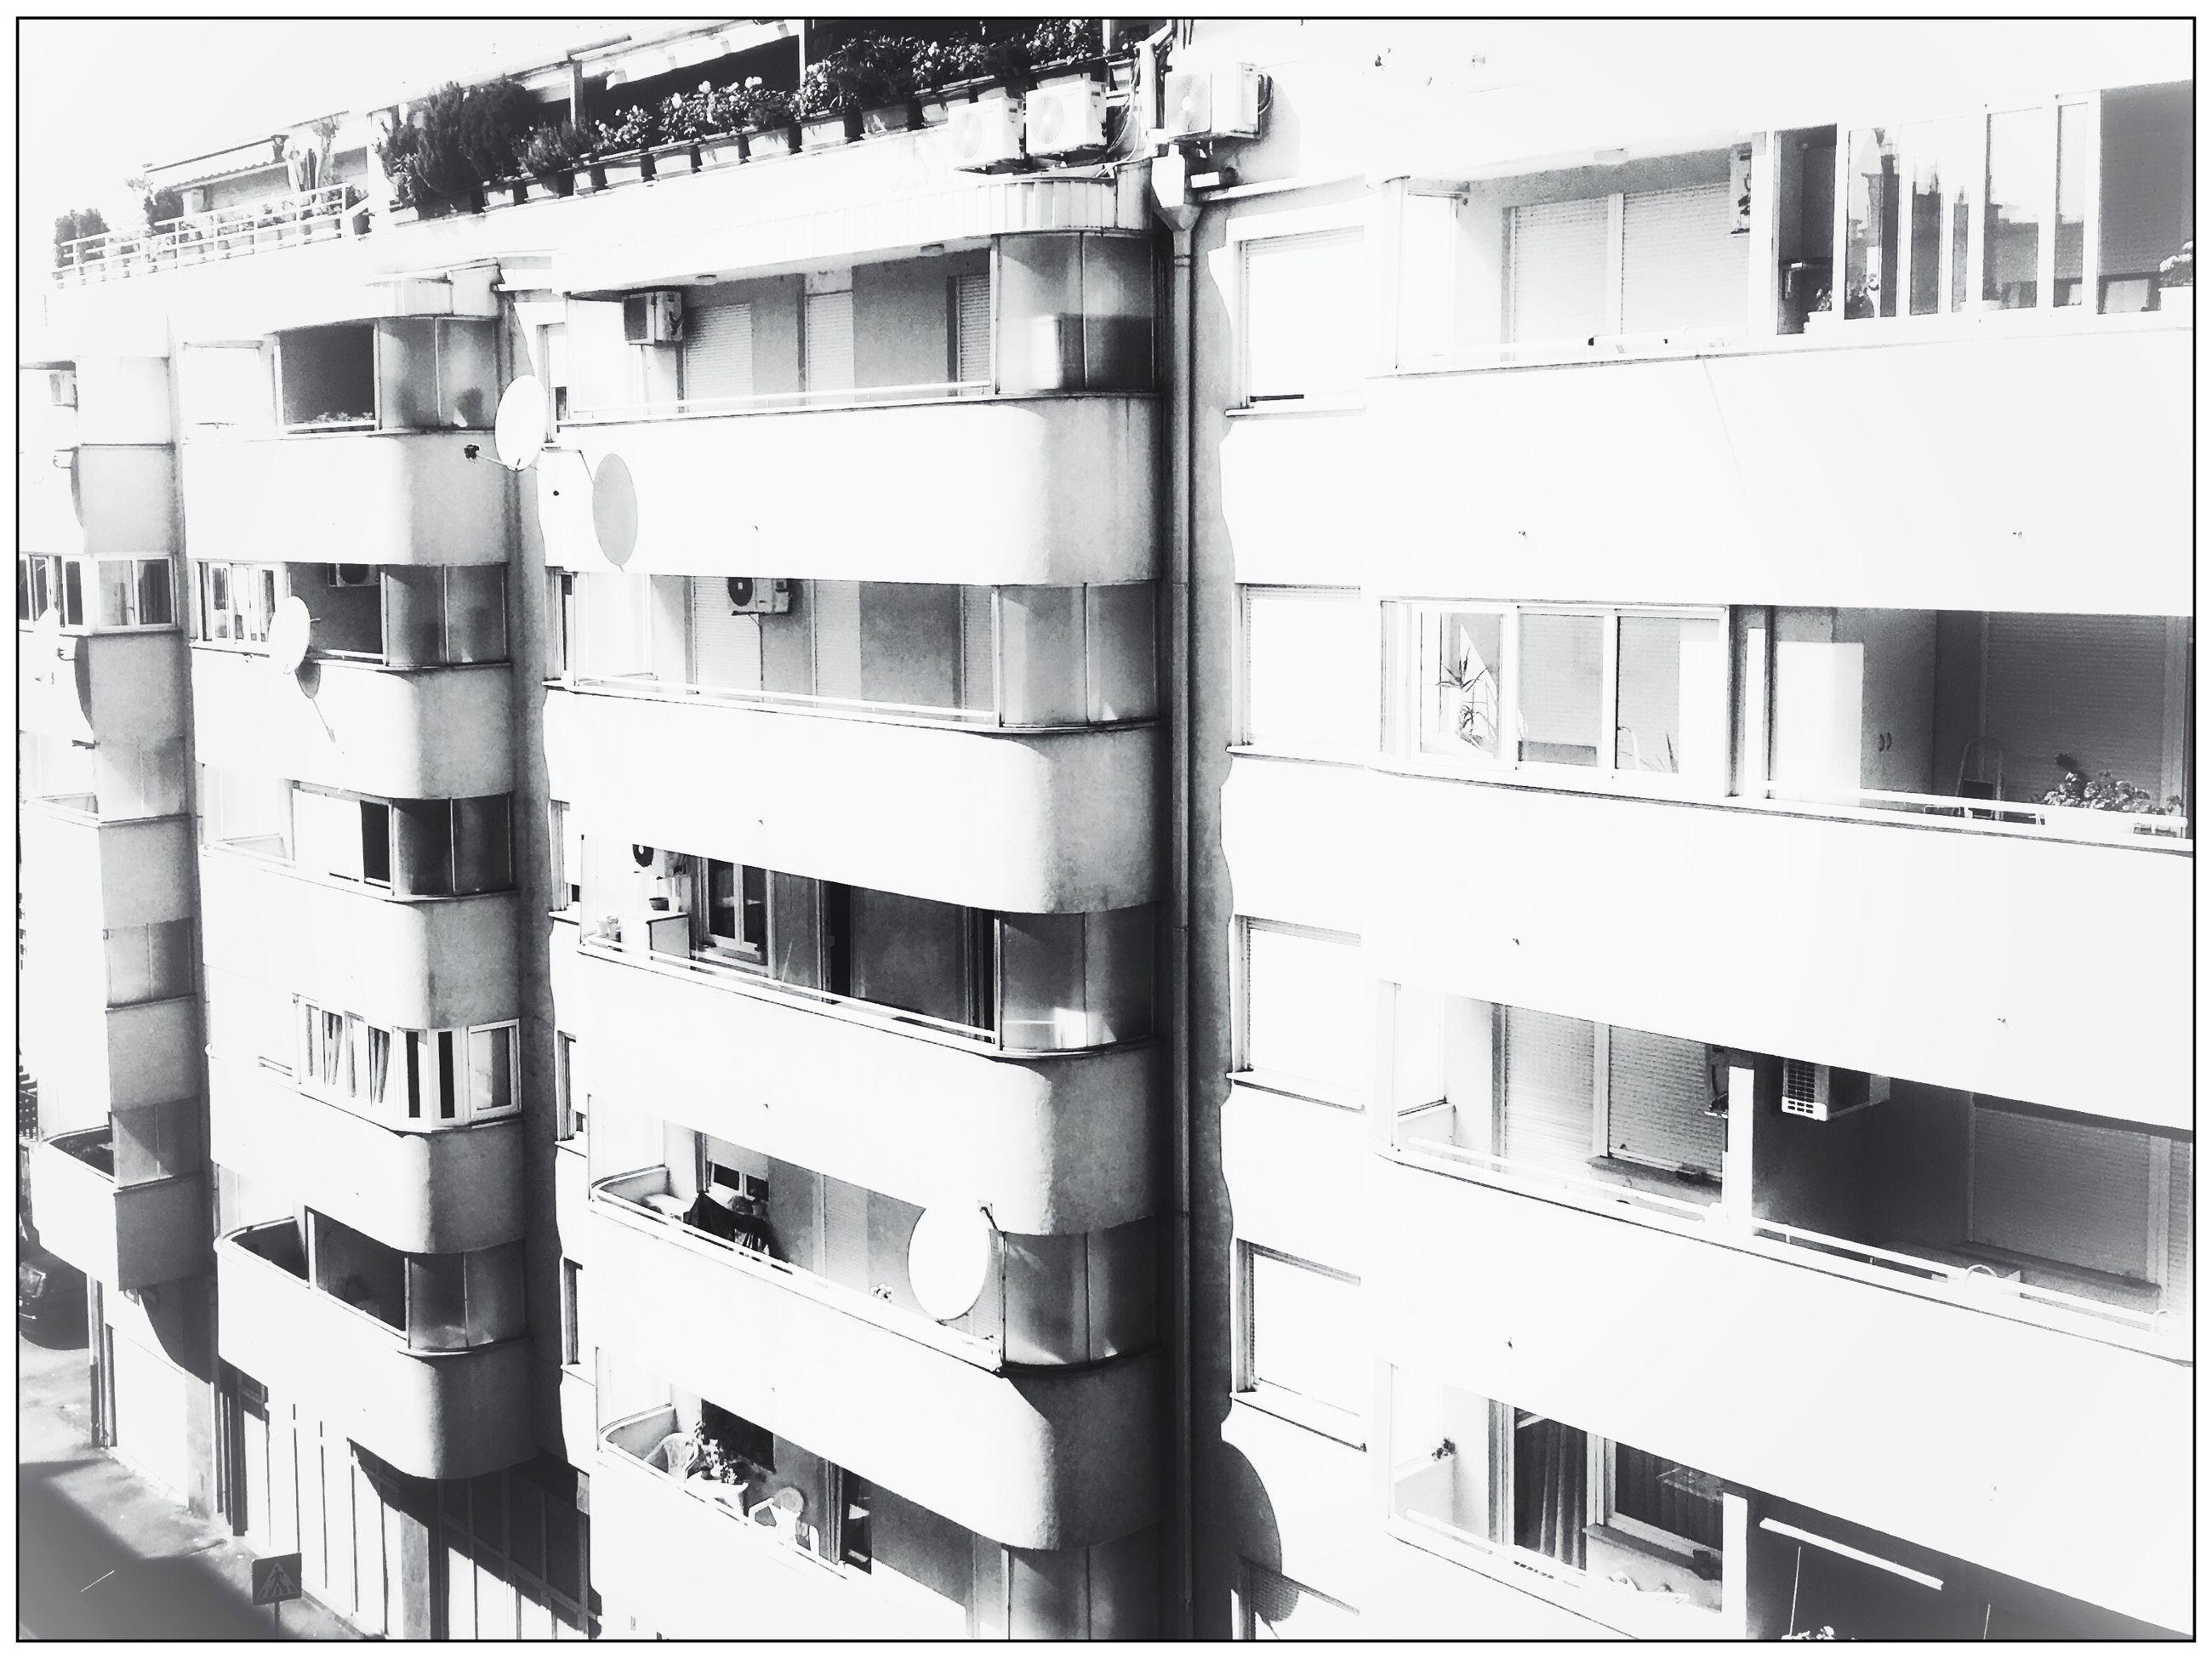 WINDOW OF APARTMENT BUILDING